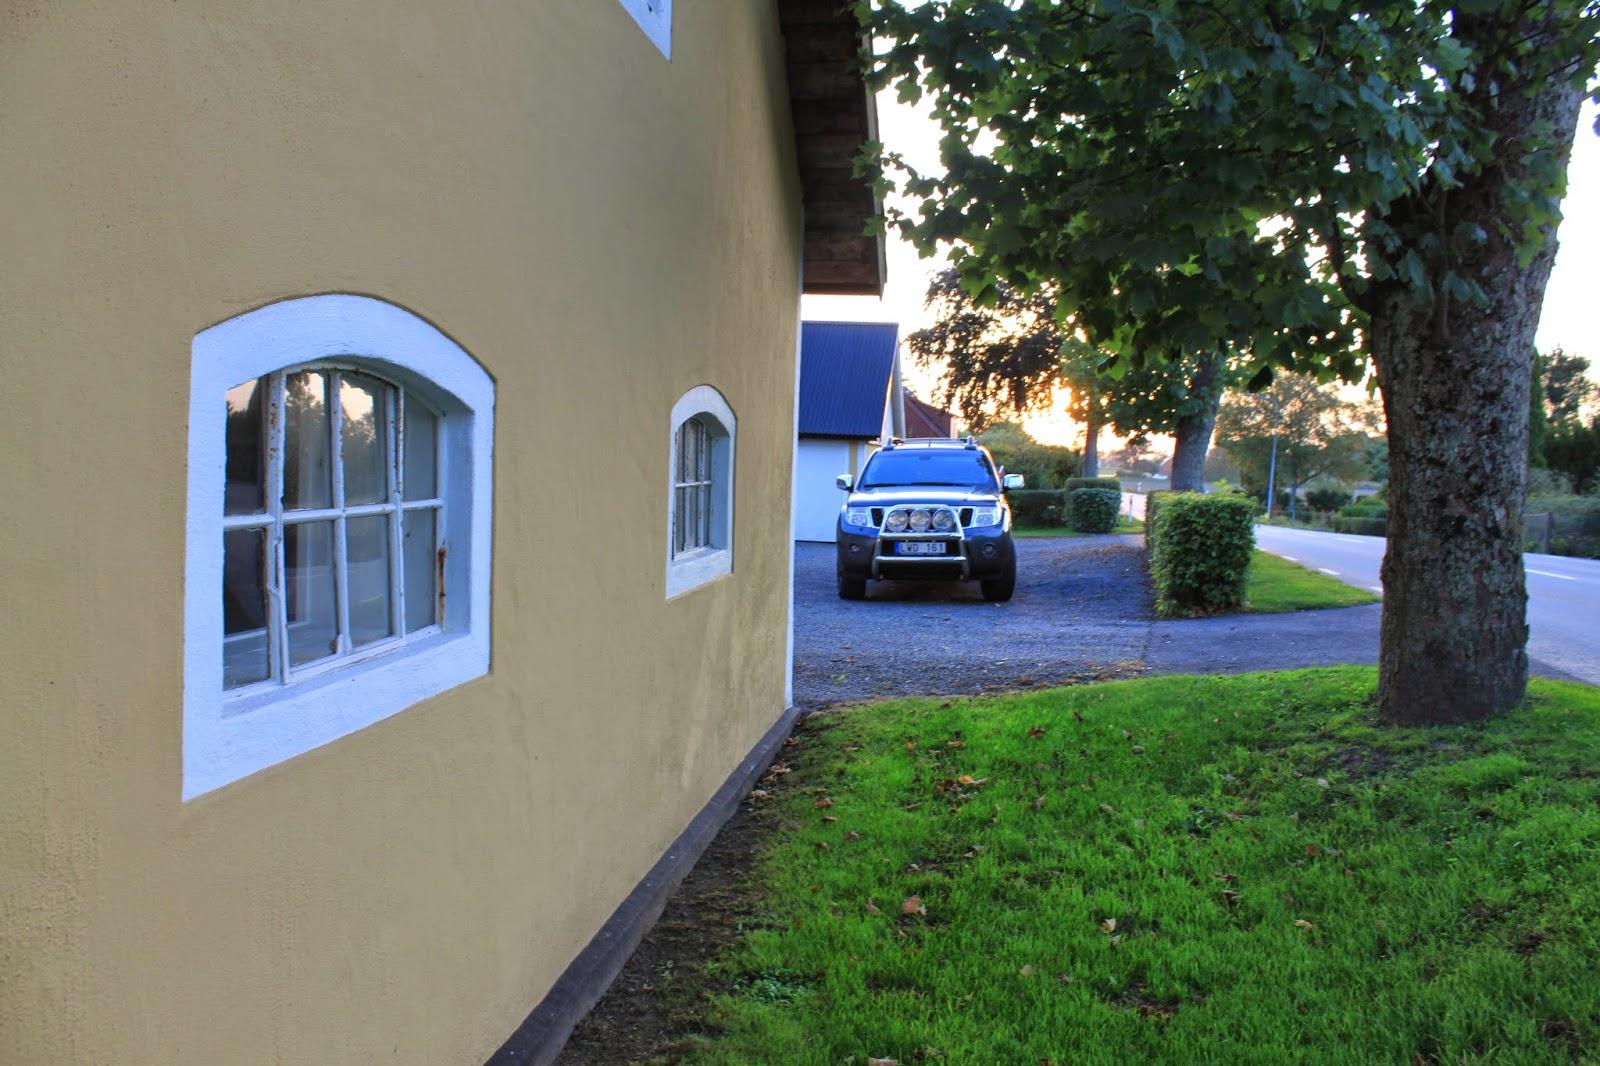 Sanna-Maries Trädgårdsrum: september 2014